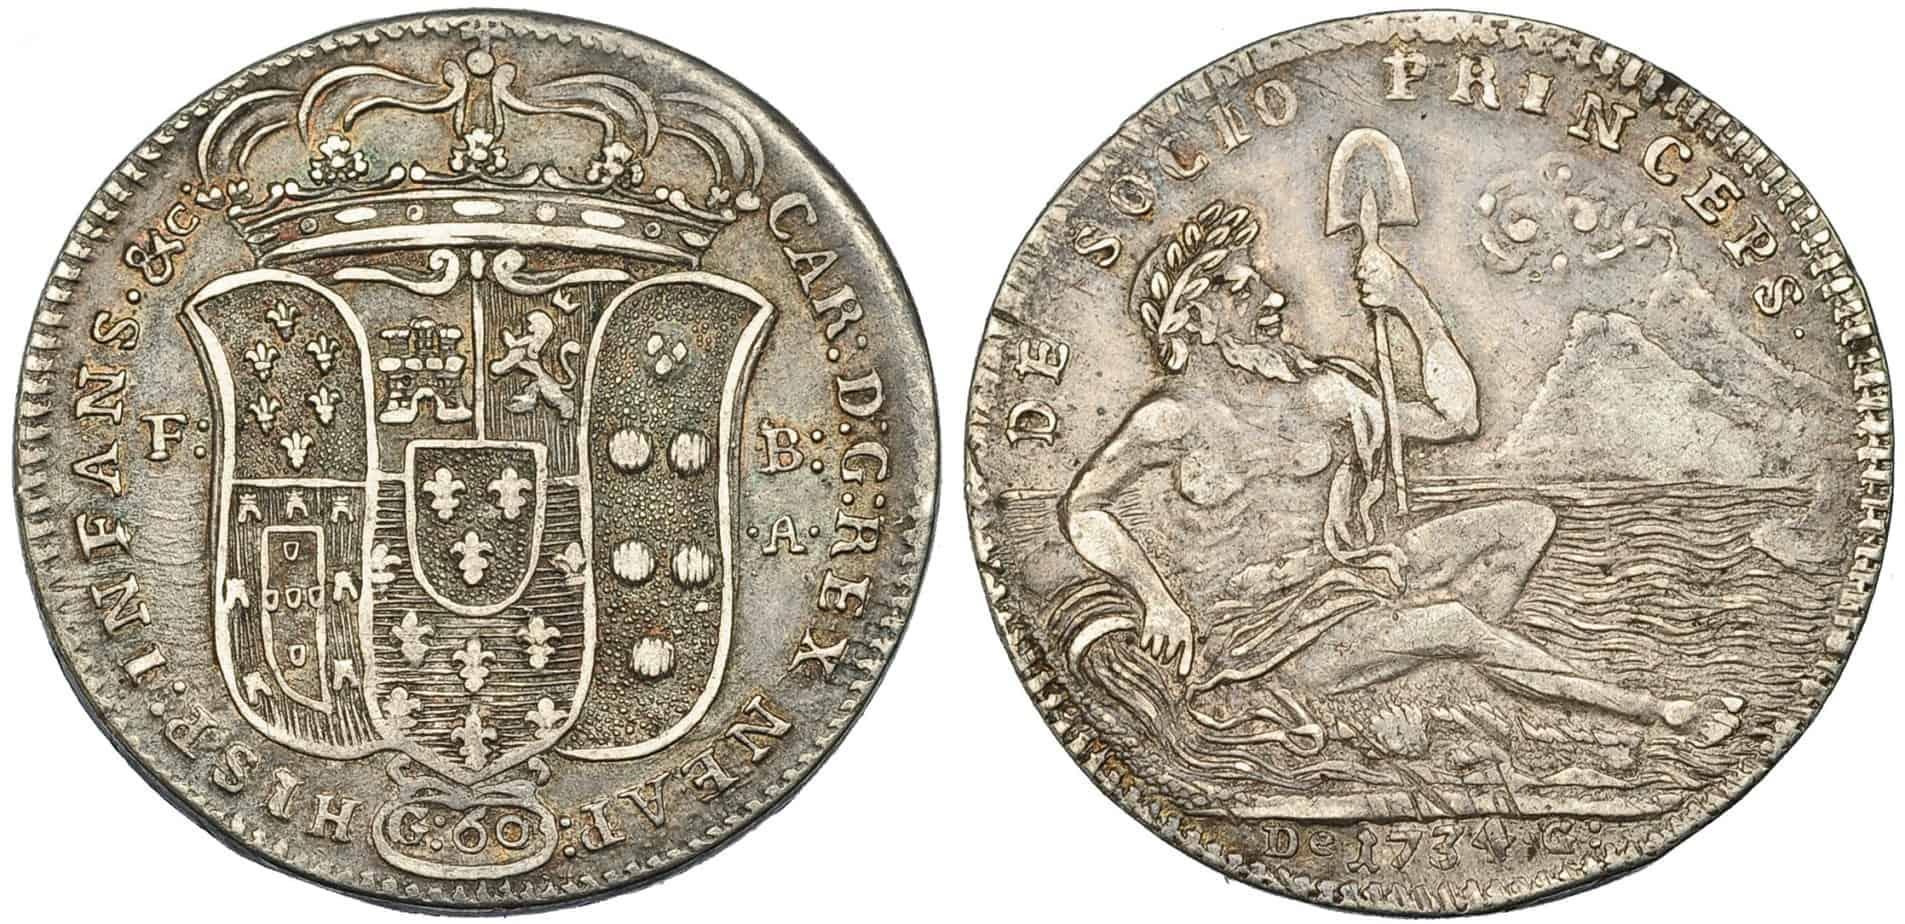 60 grana de Nápoles, 1734